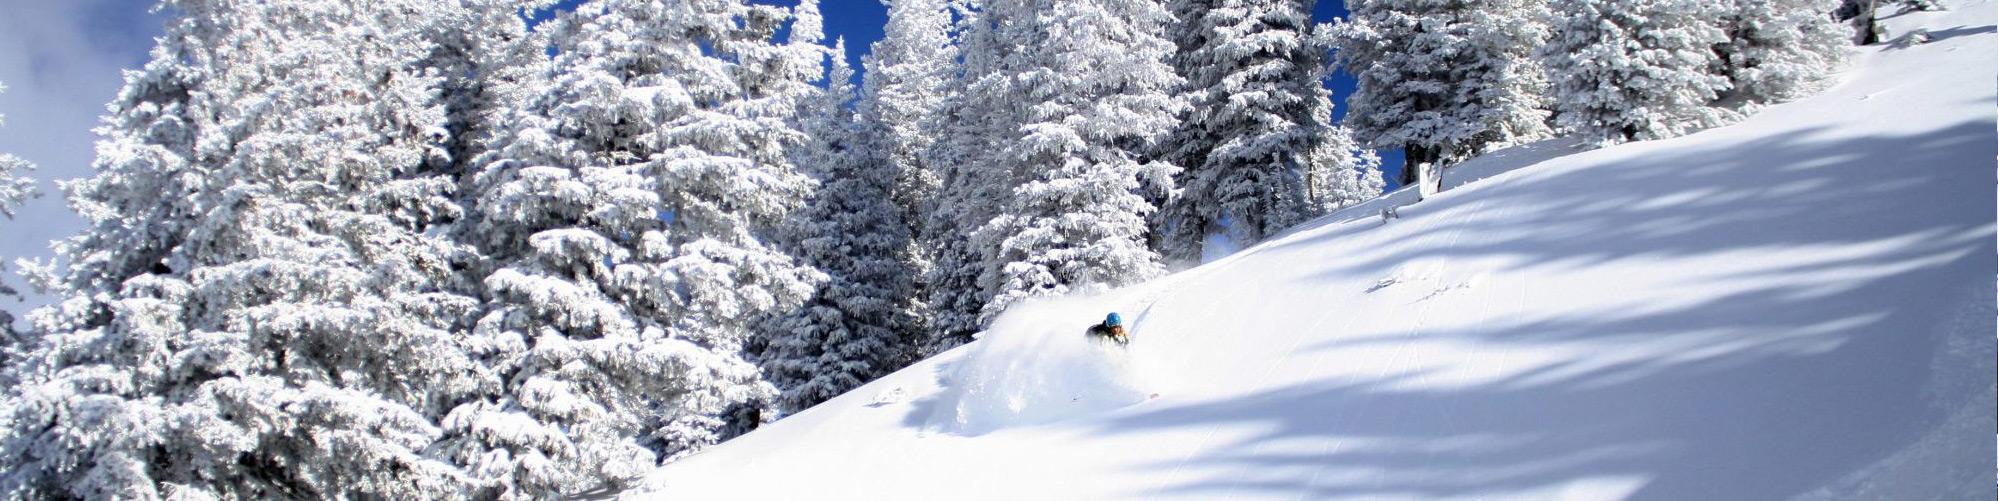 Colorado-Powder-Ski-Trip